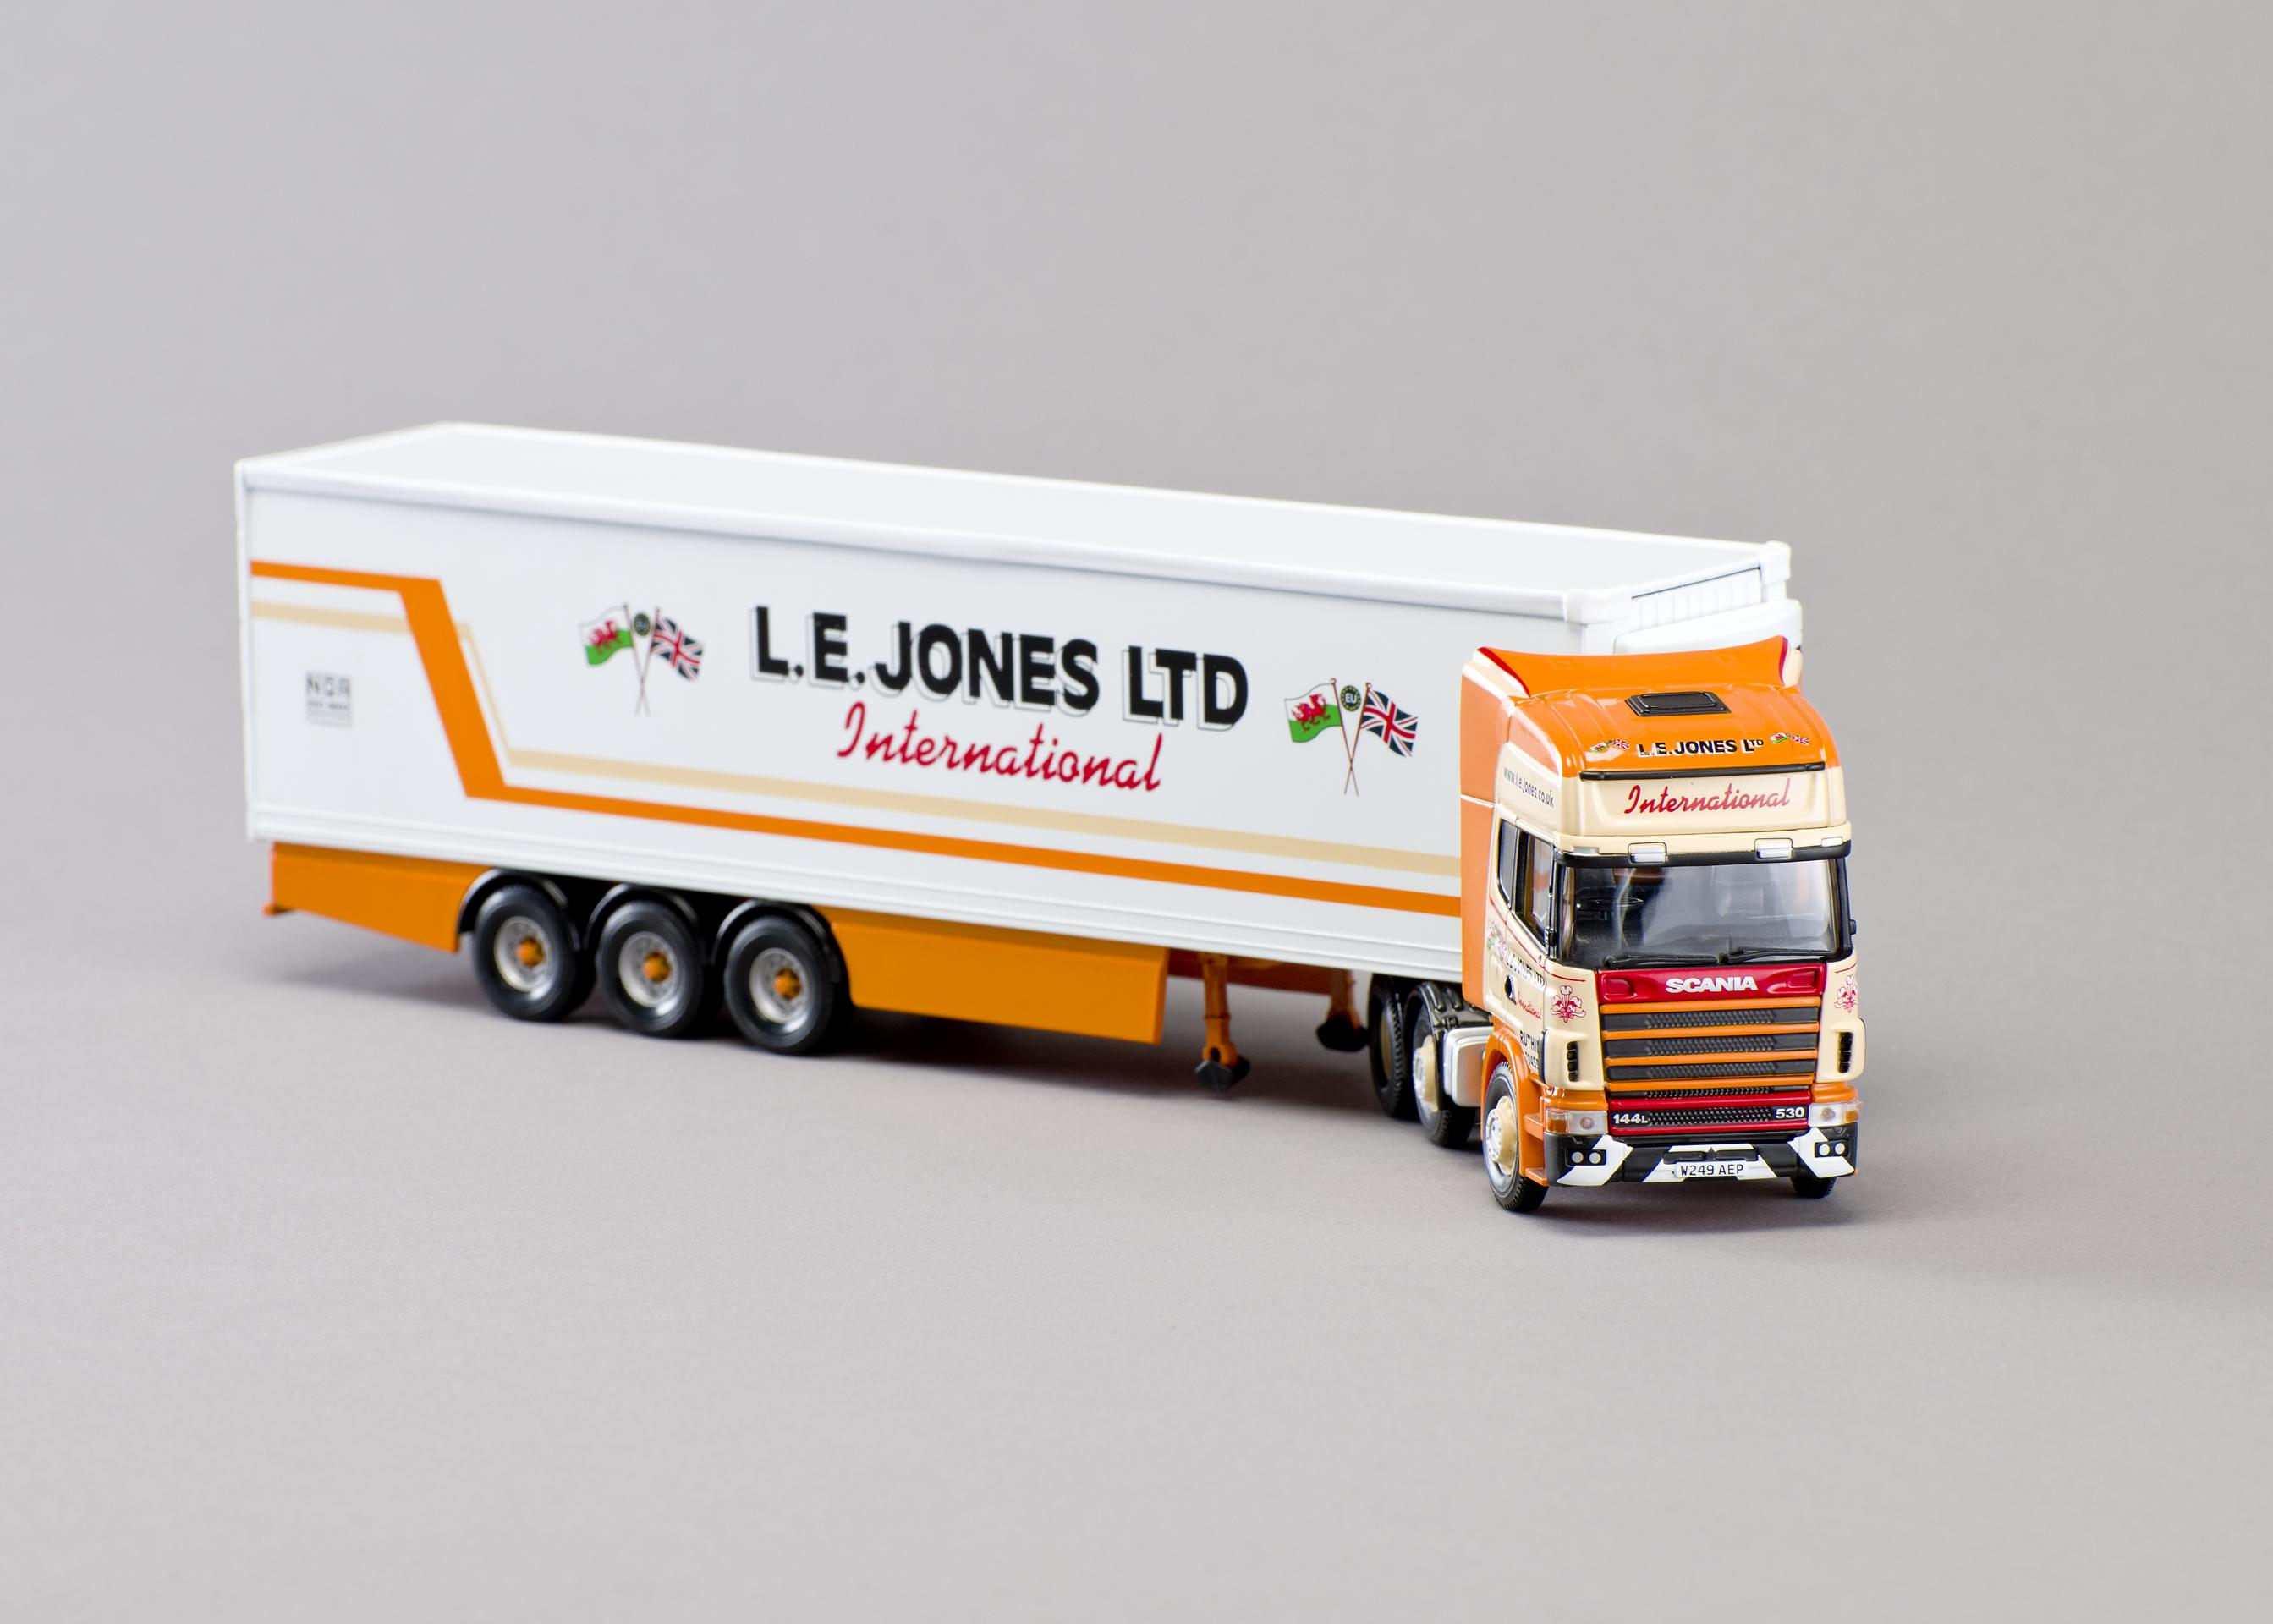 low priced c3dfa 09409 L.E. Jones Ltd., lorry model - Collections Online | National ...